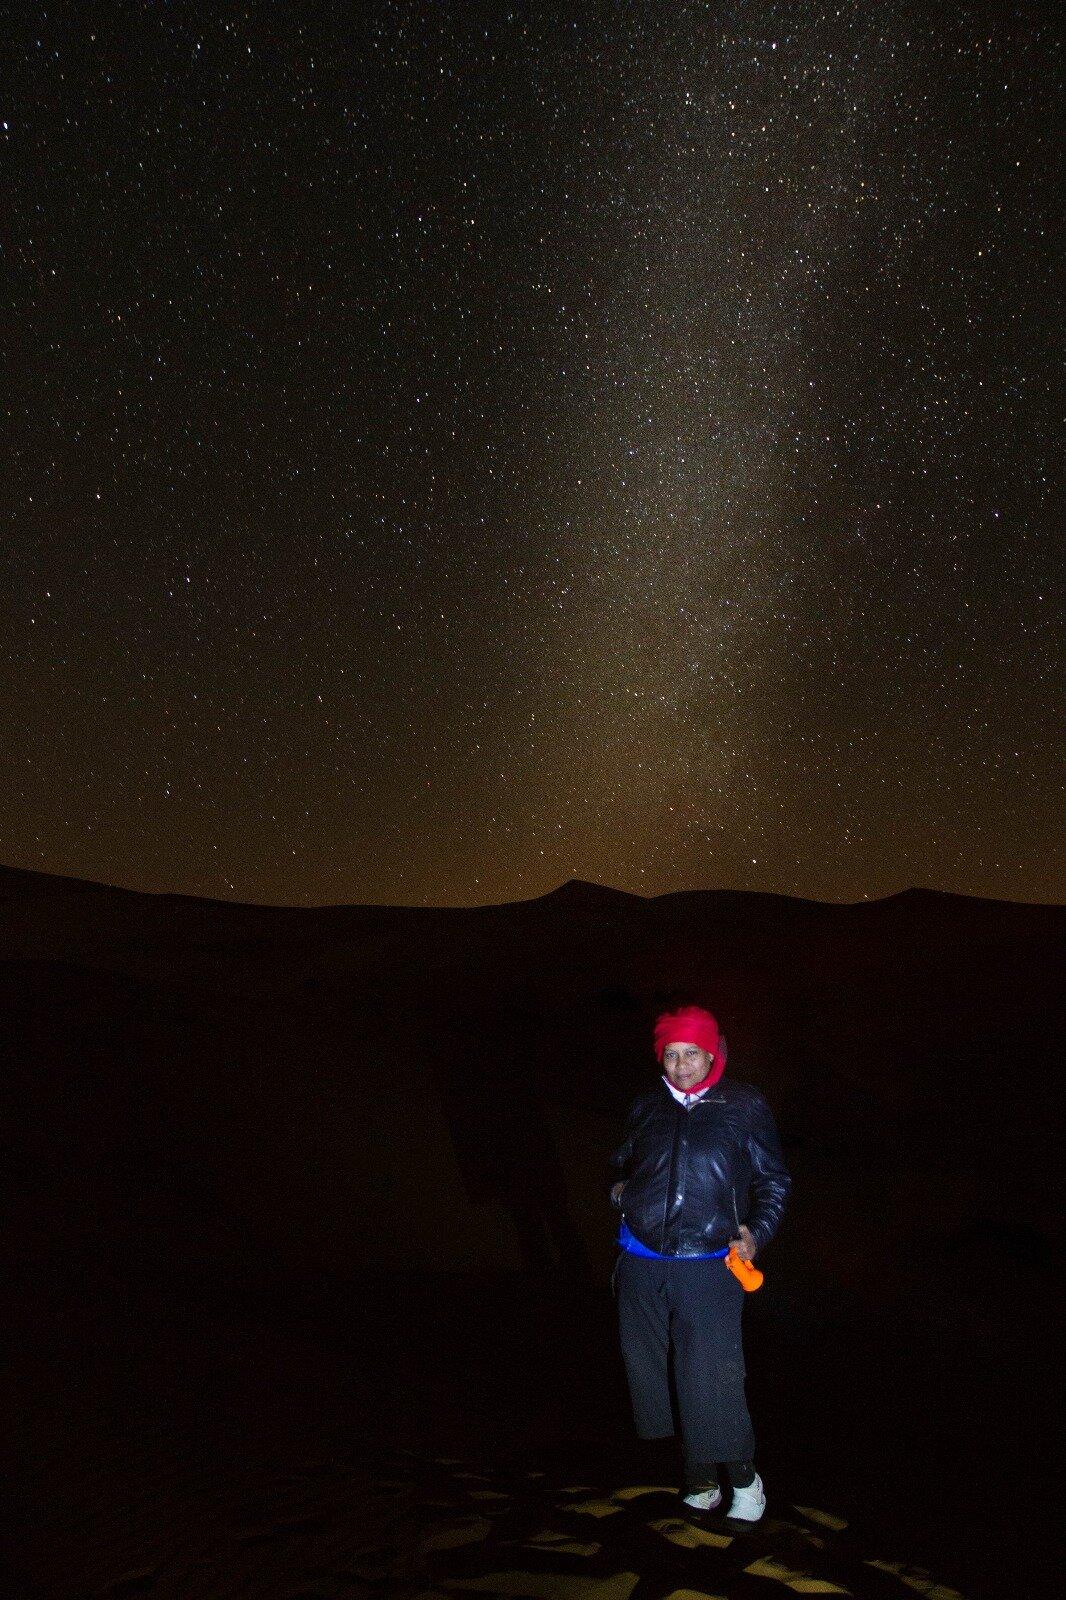 A Night in the Sahara